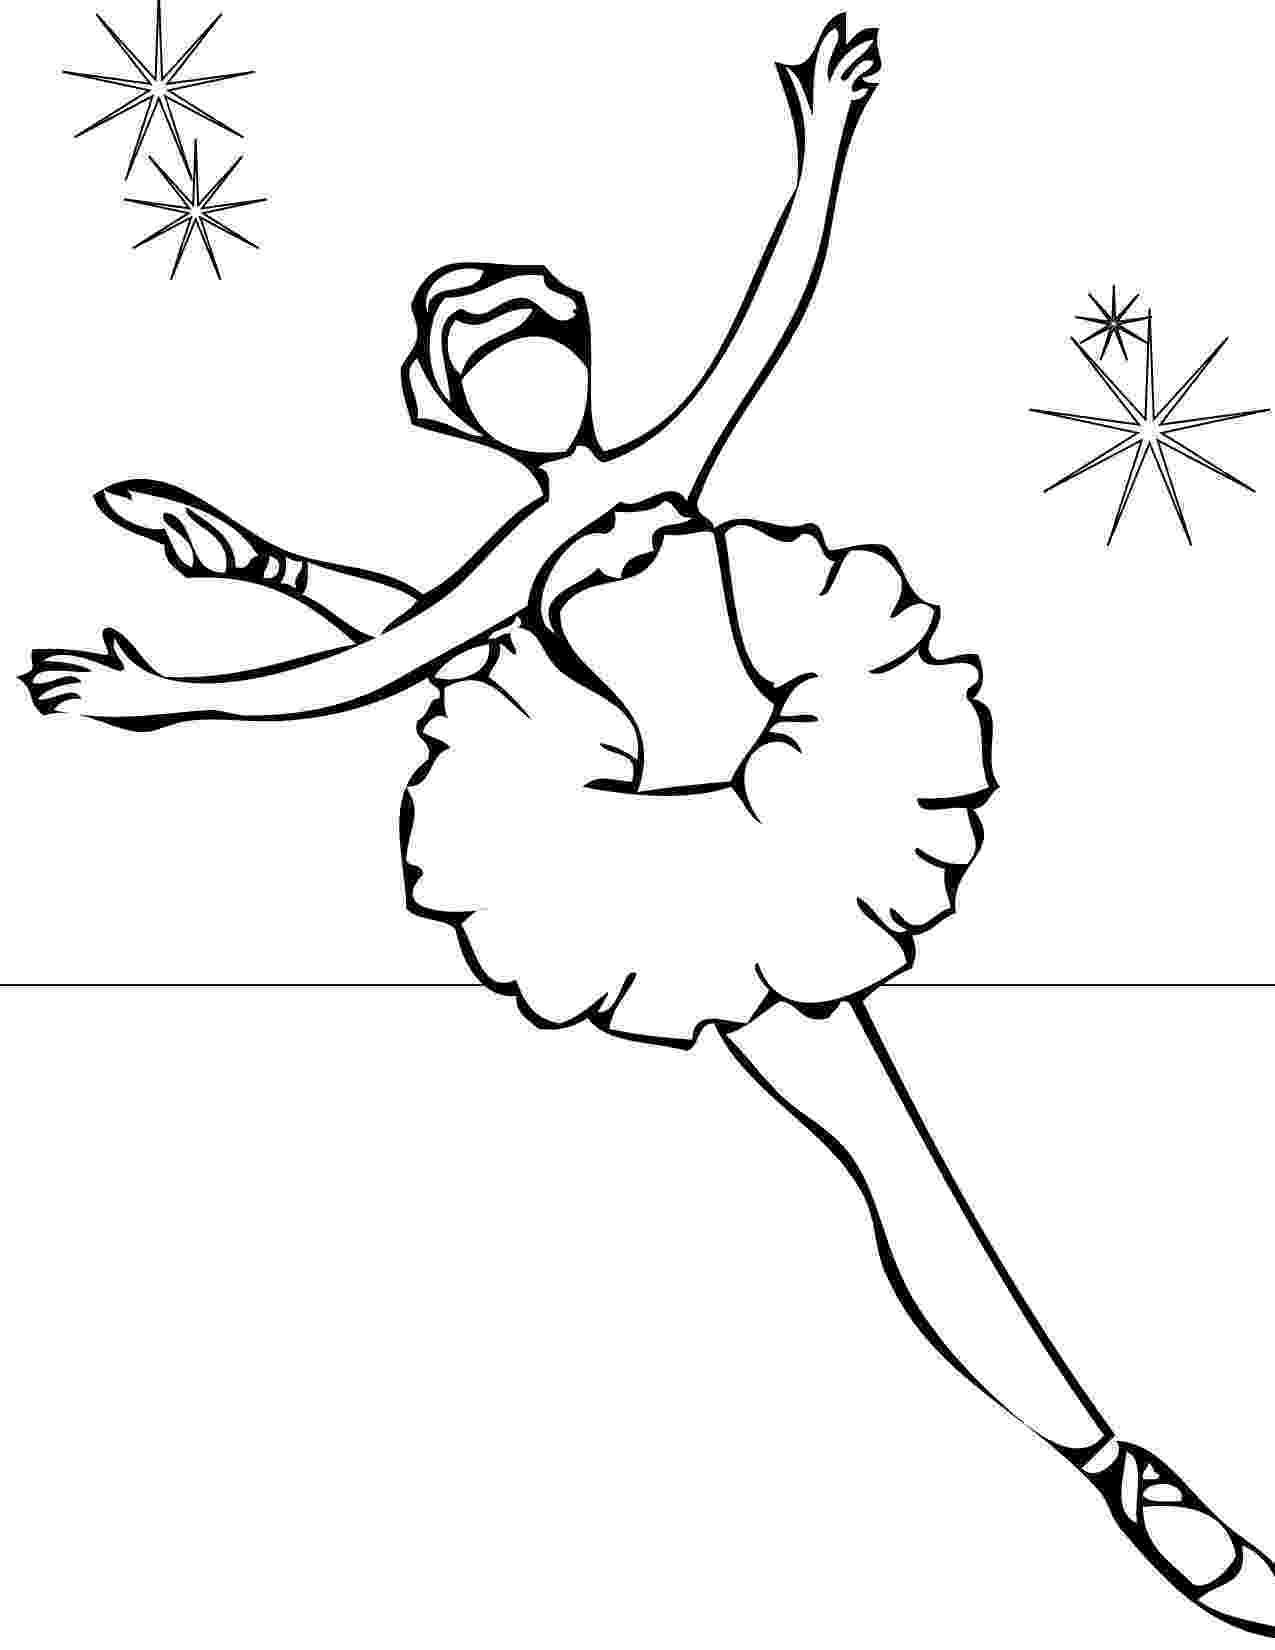 ballet coloring sheets free printable ballet coloring pages for kids coloring ballet sheets 1 1